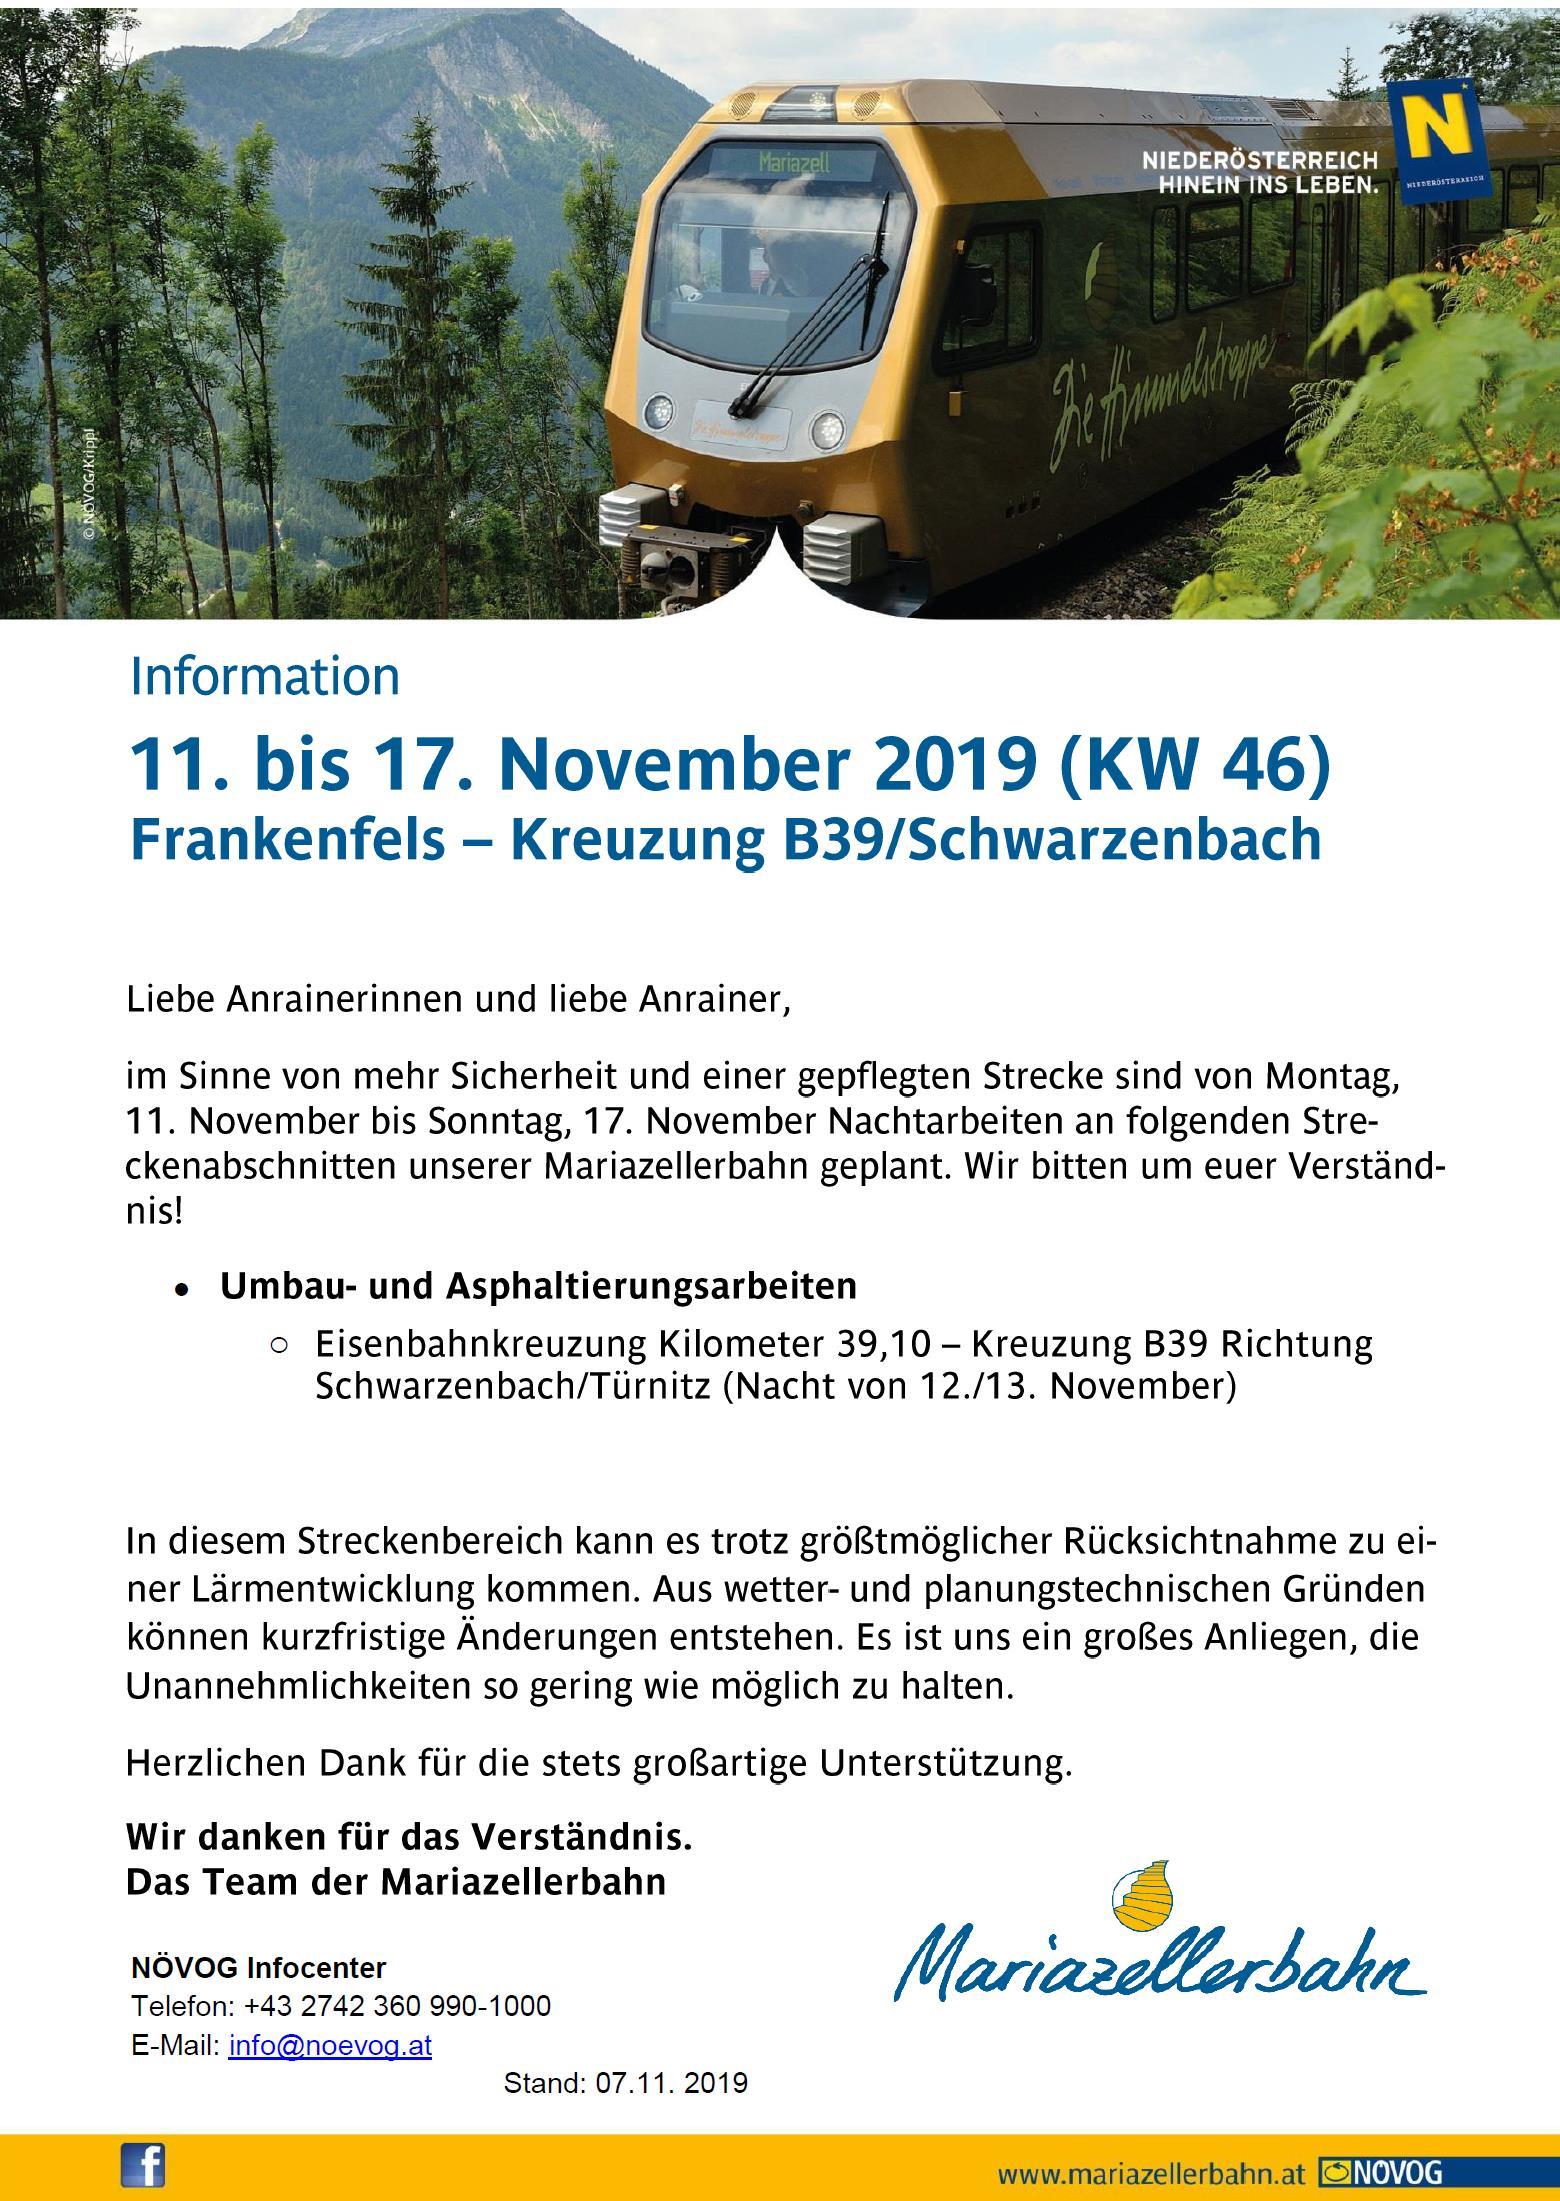 Information Mariazellerbahn Frankenfels B39 November